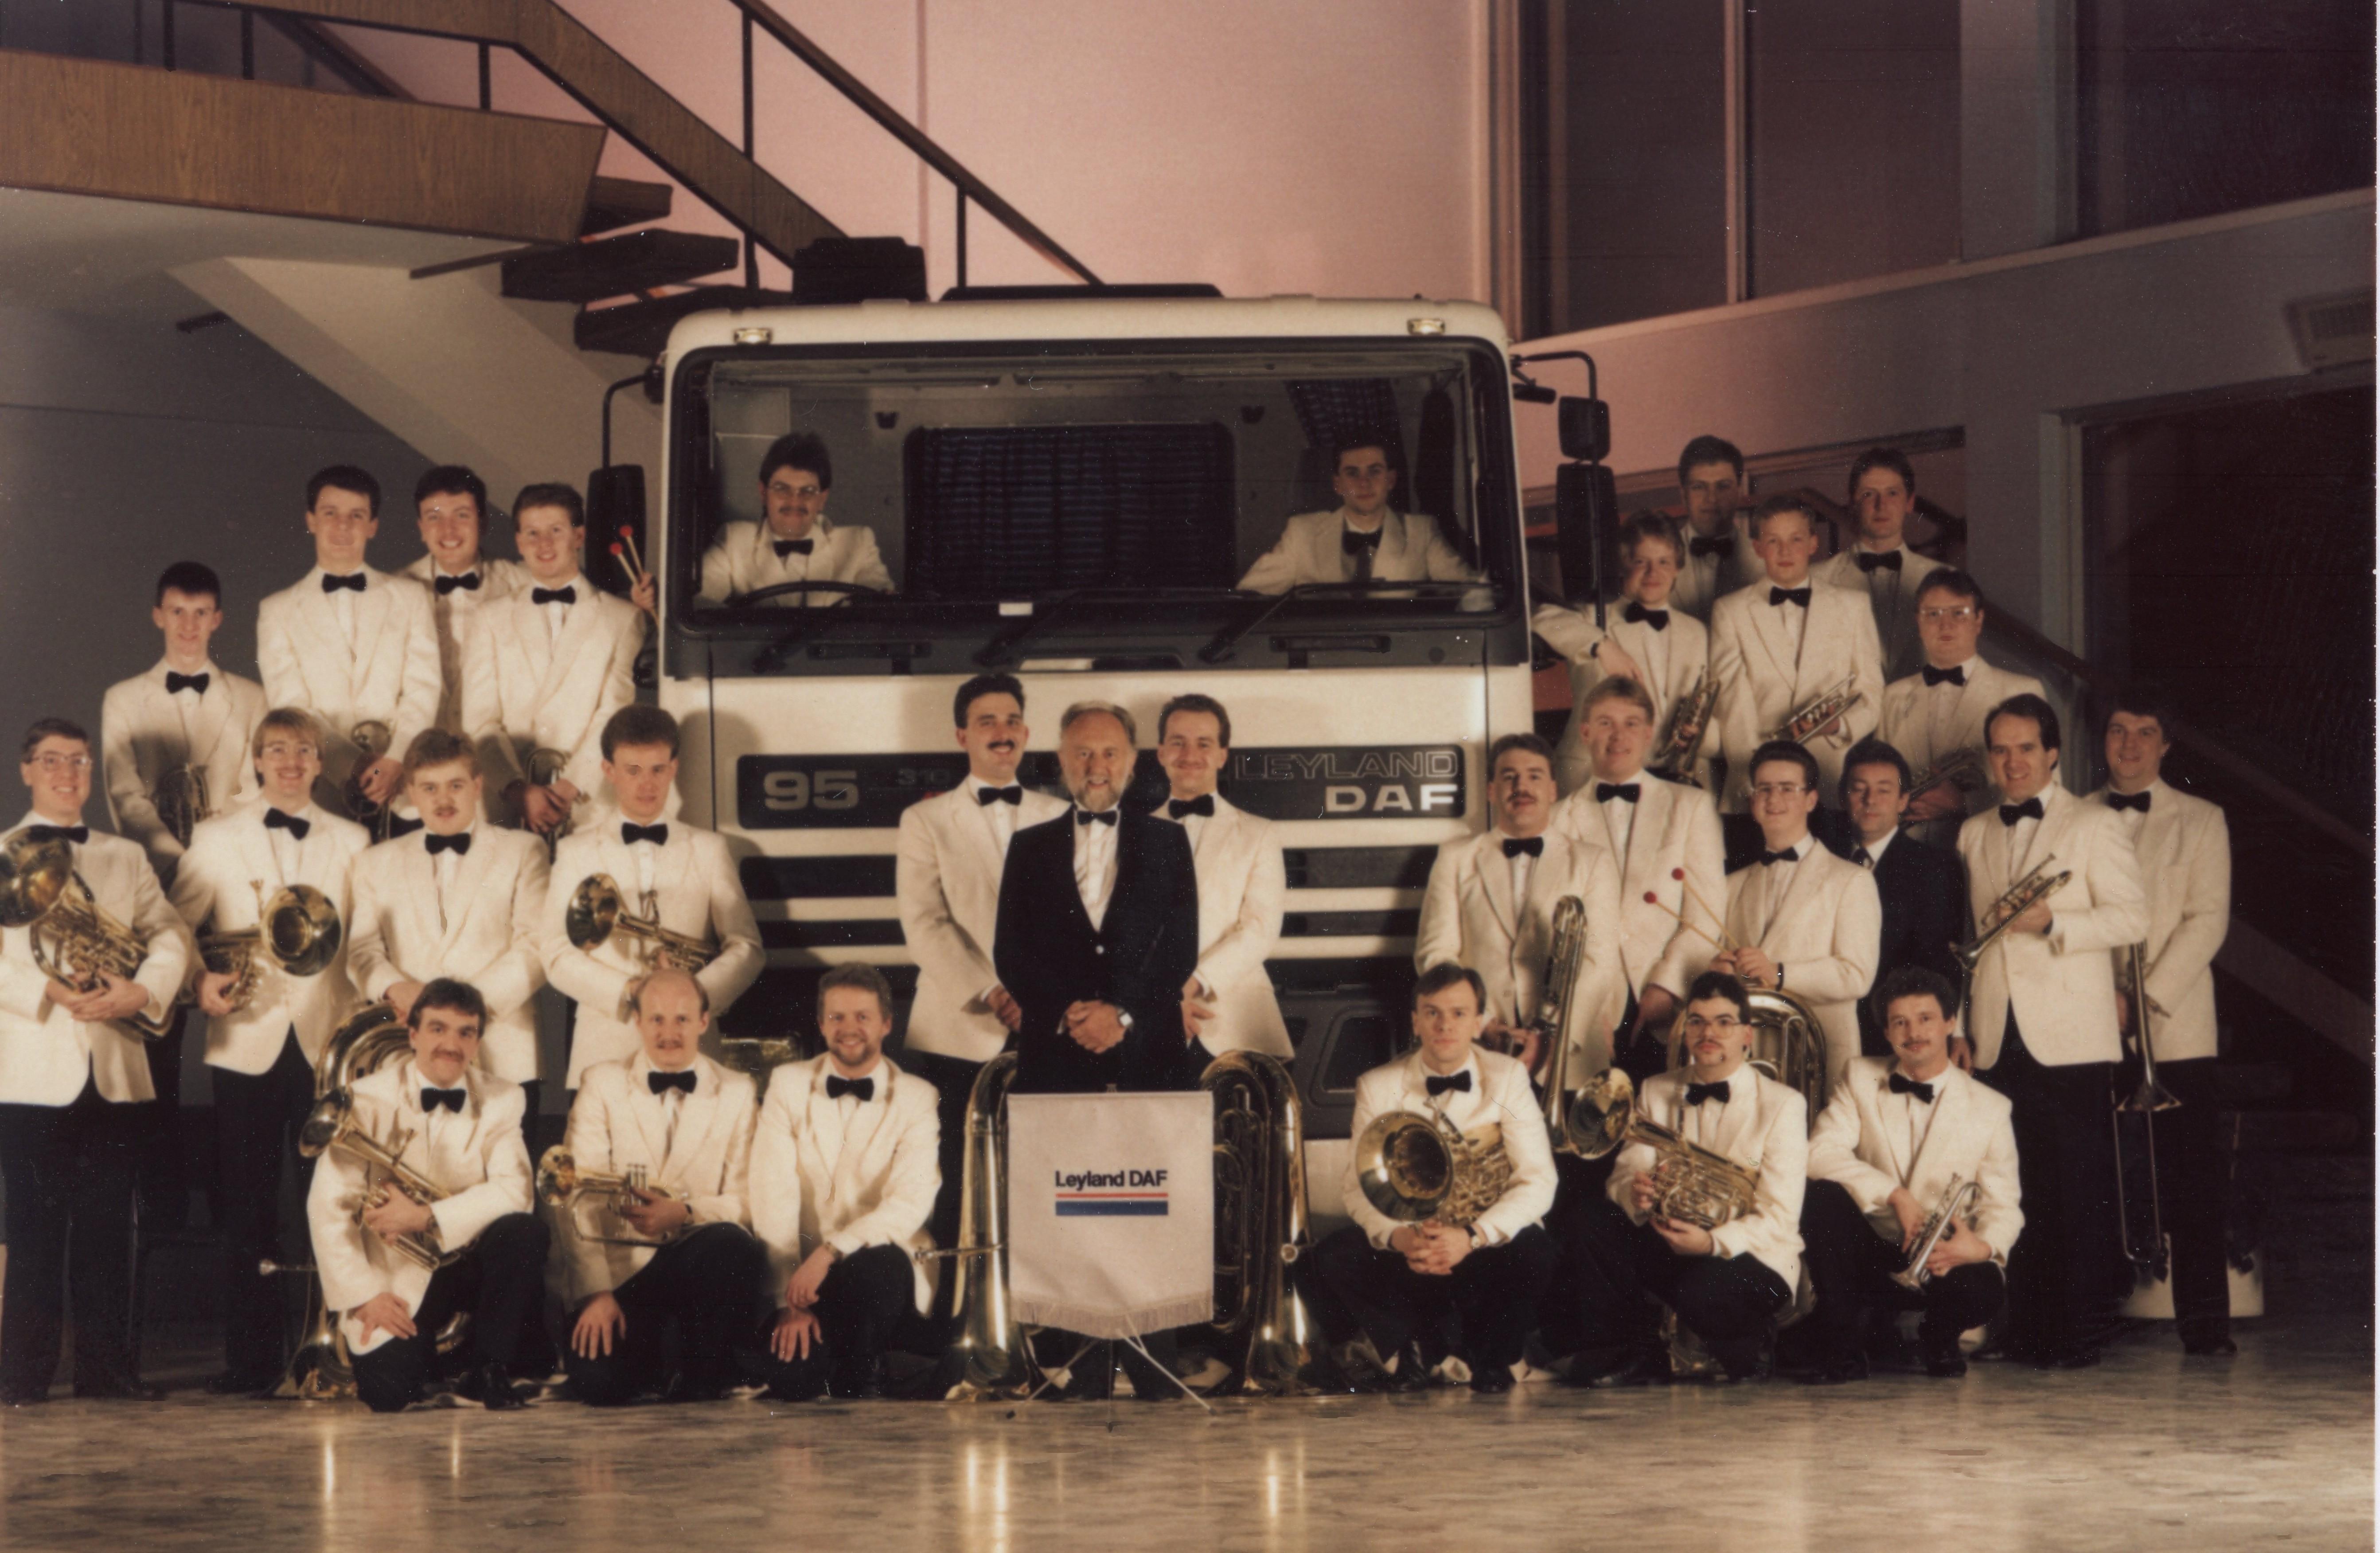 Leyland DAF Band